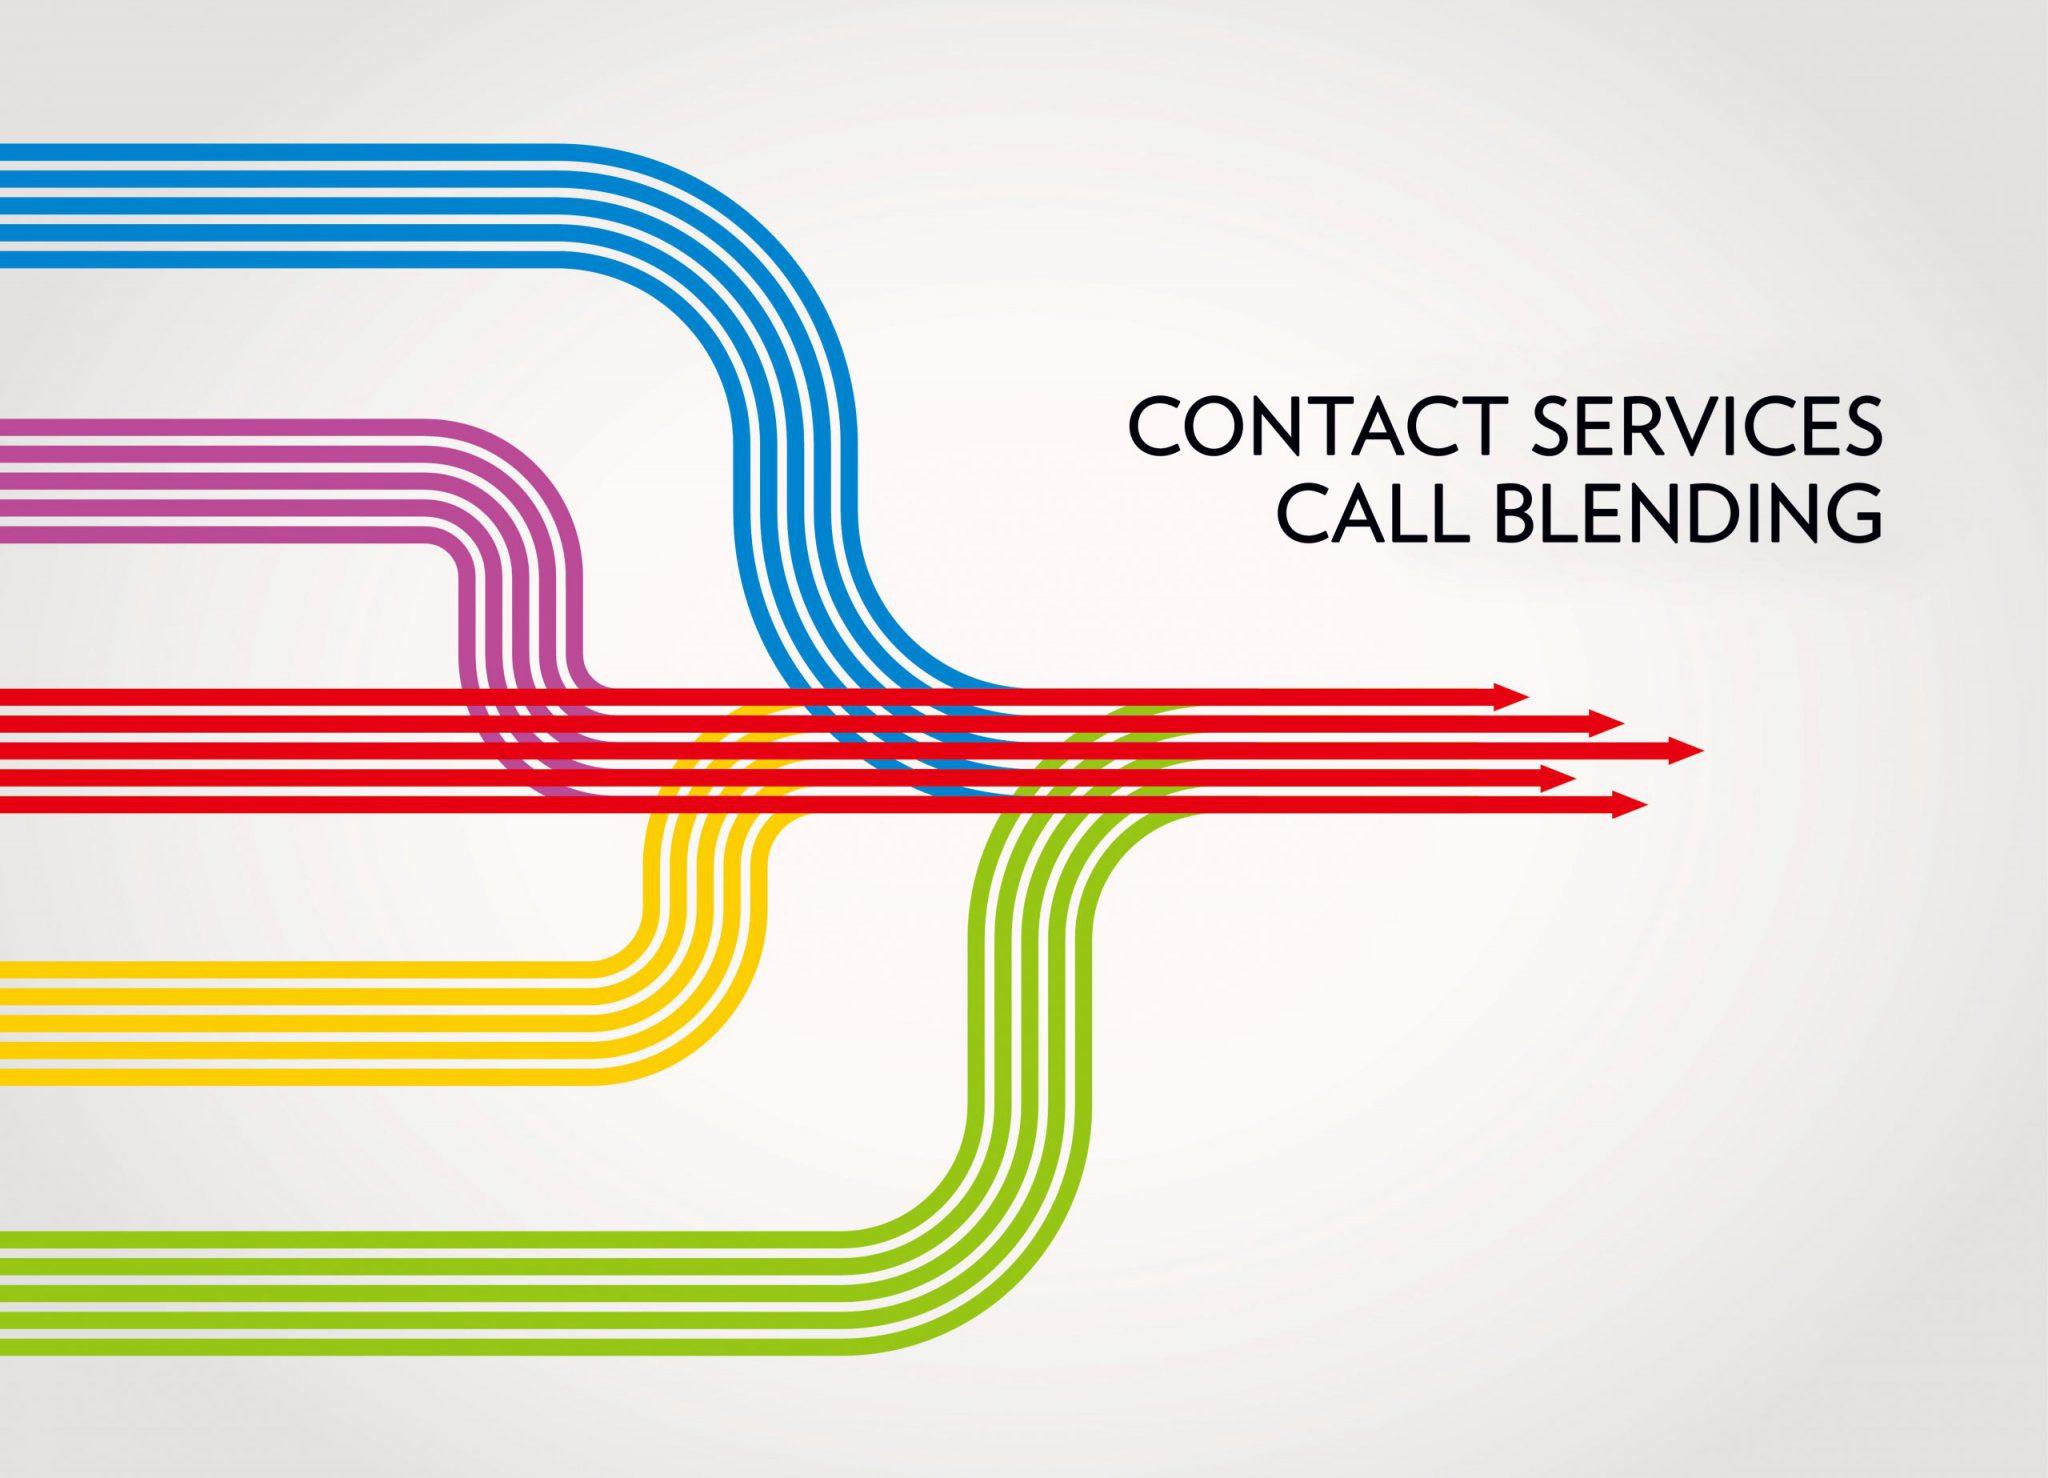 call blending